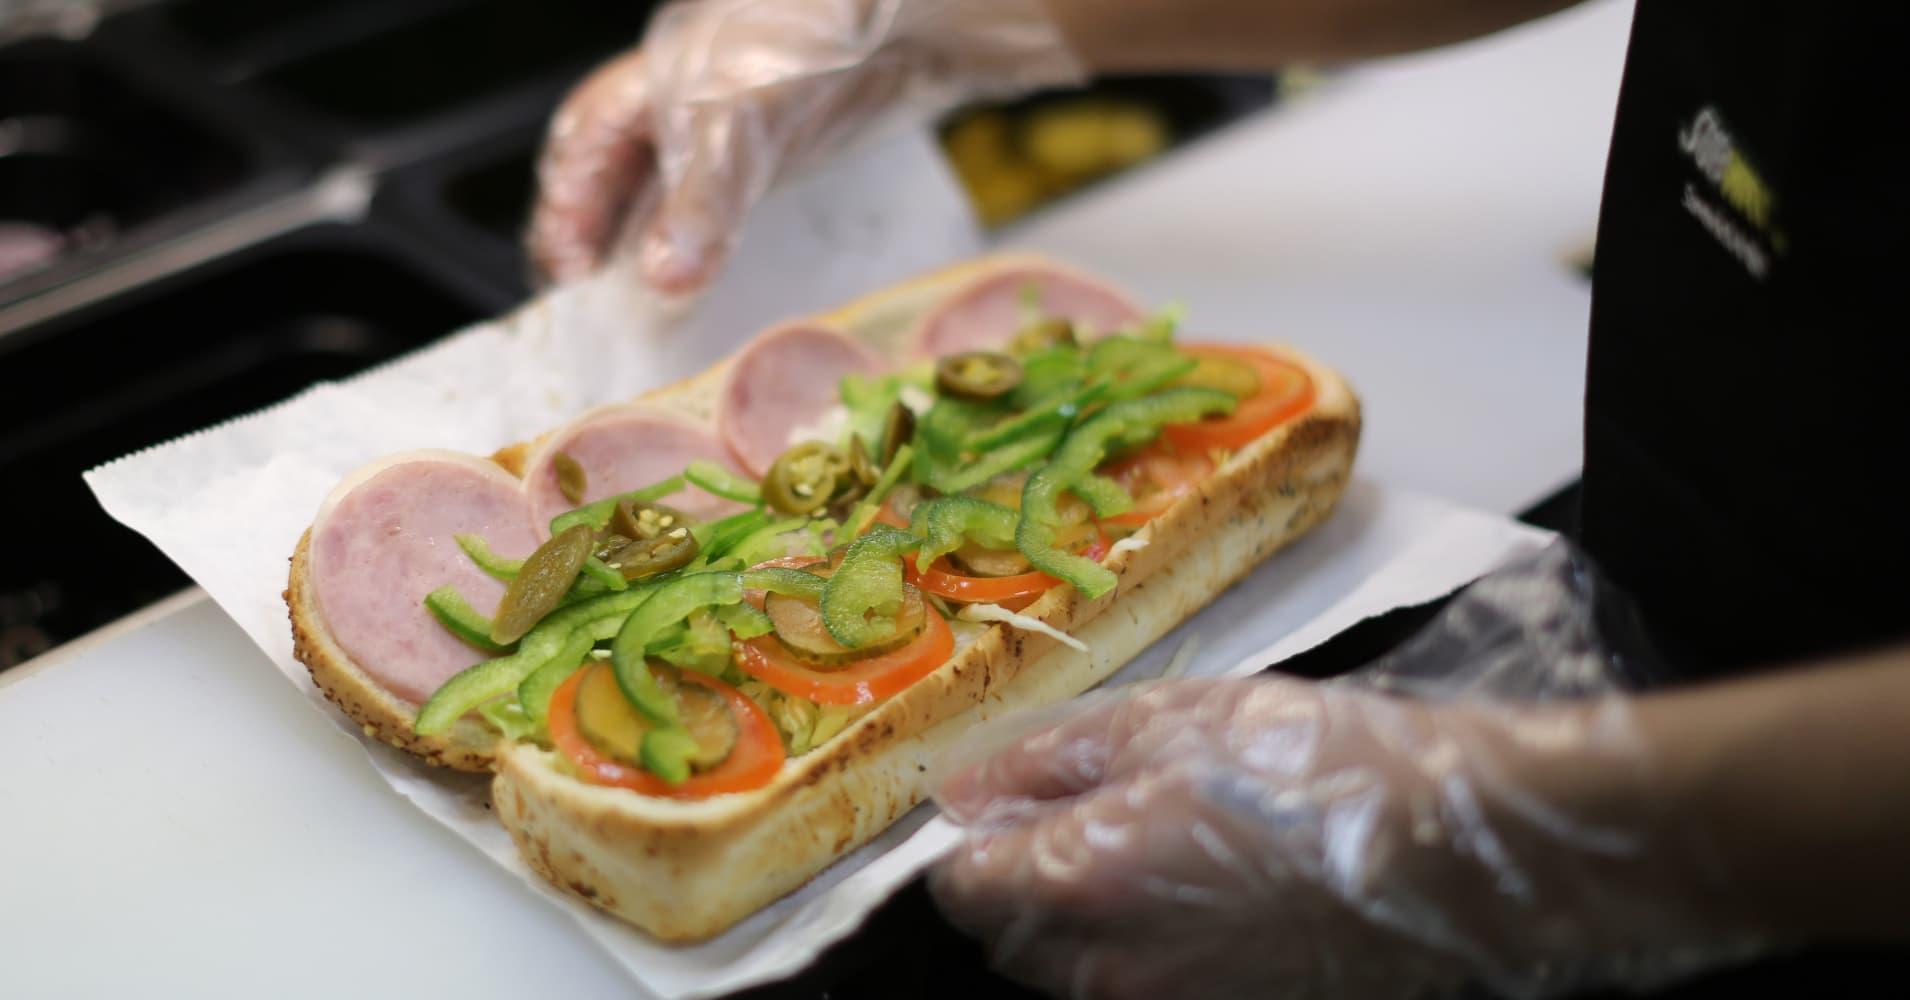 Subway Has More Restaurants Than Mcdonalds And Starbucks